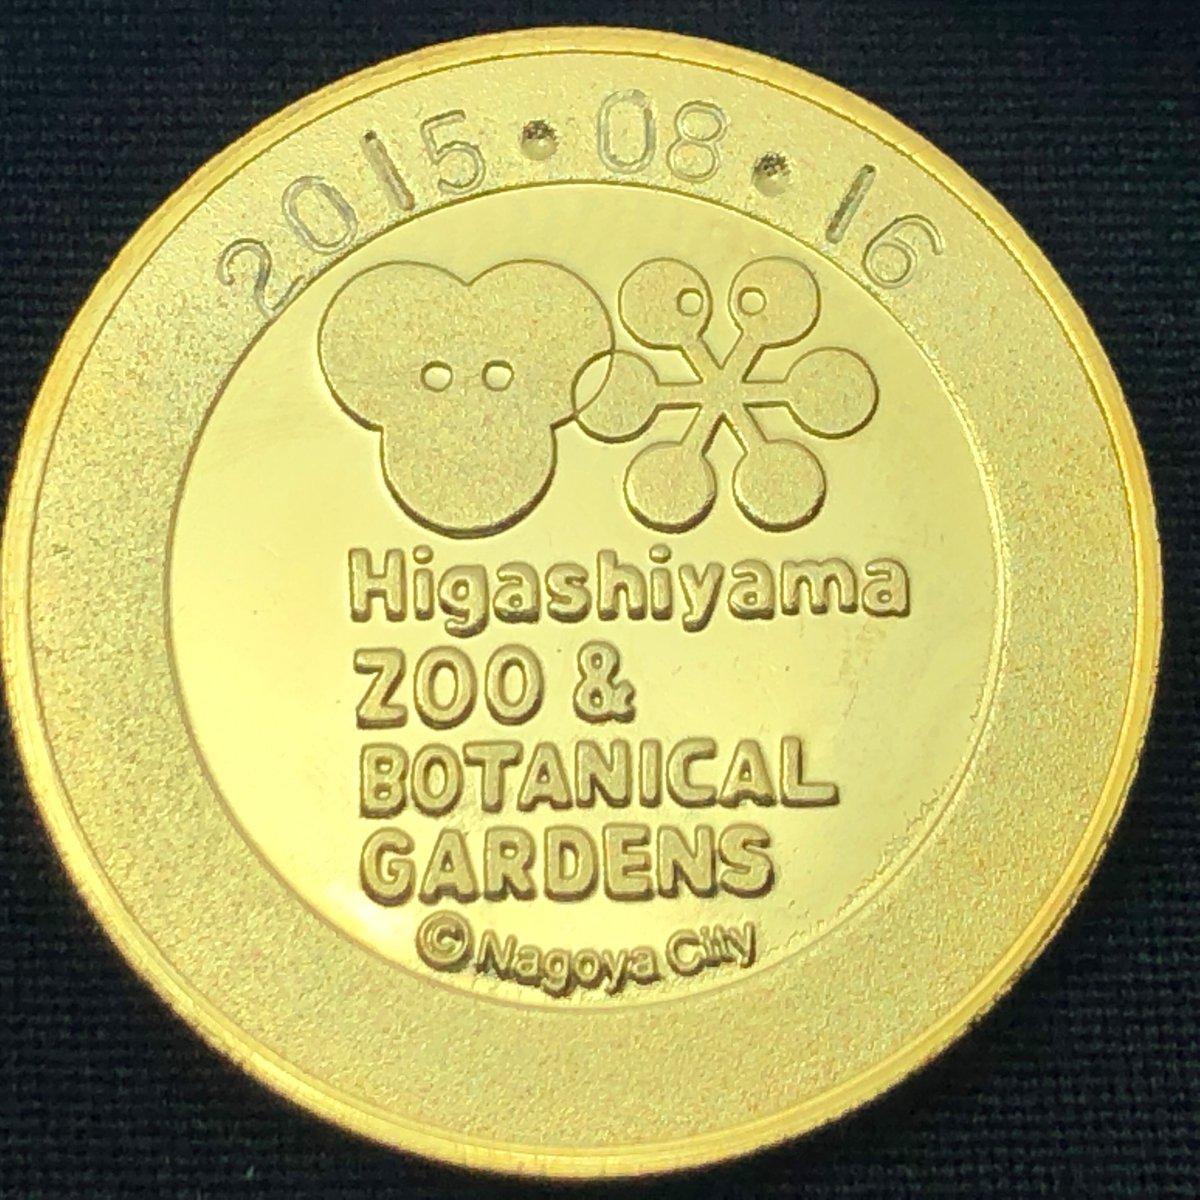 test ツイッターメディア - 東山動植物園の記念メダル(ゾウ)。 https://t.co/9UBHelqbeo